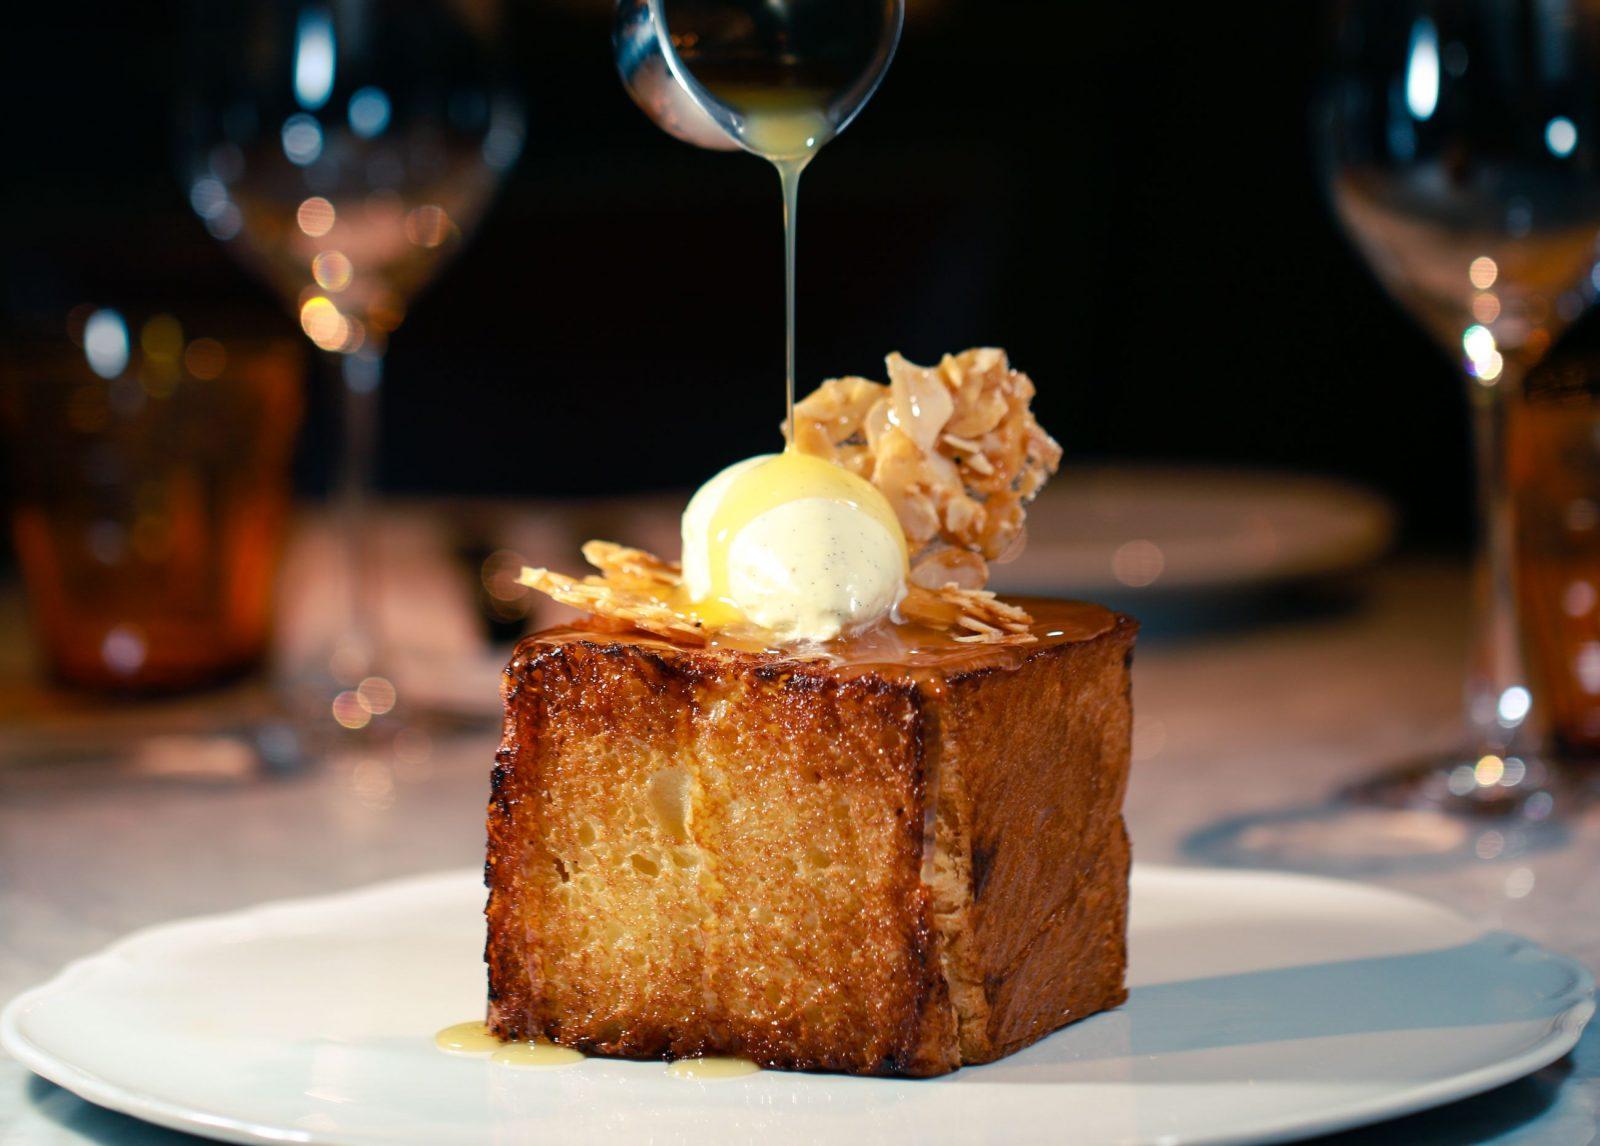 Bardot Brasserie French Toast at Aria Las Vegas